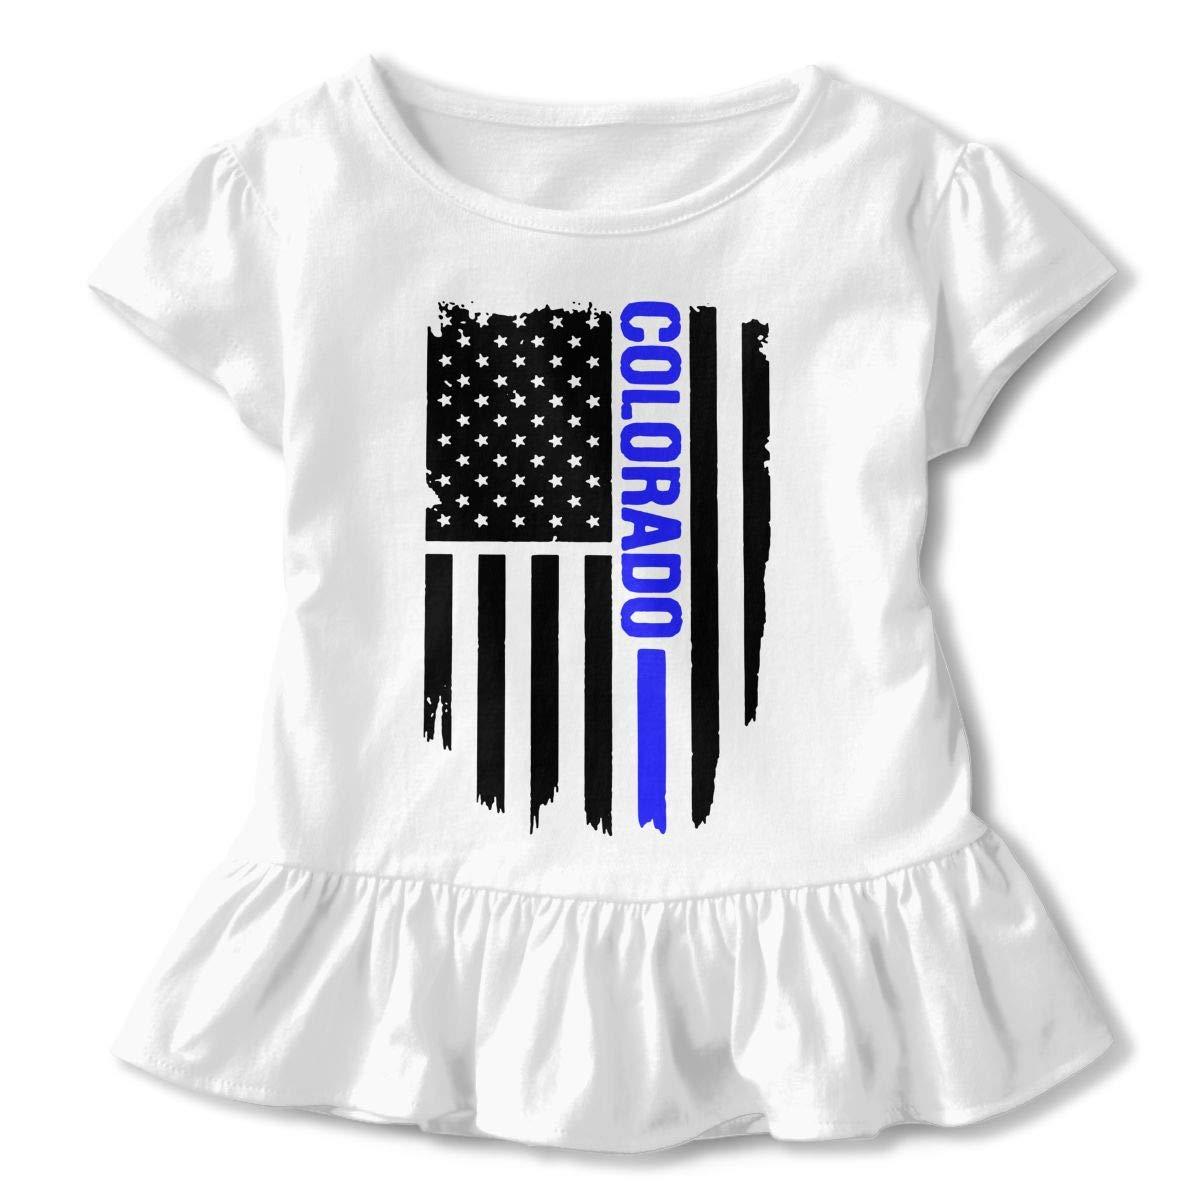 SHIRT1-KIDS Colorado Thin Blue Line Childrens Girls Short Sleeve Ruffles Shirt Tee Jersey for 2-6 Toddlers